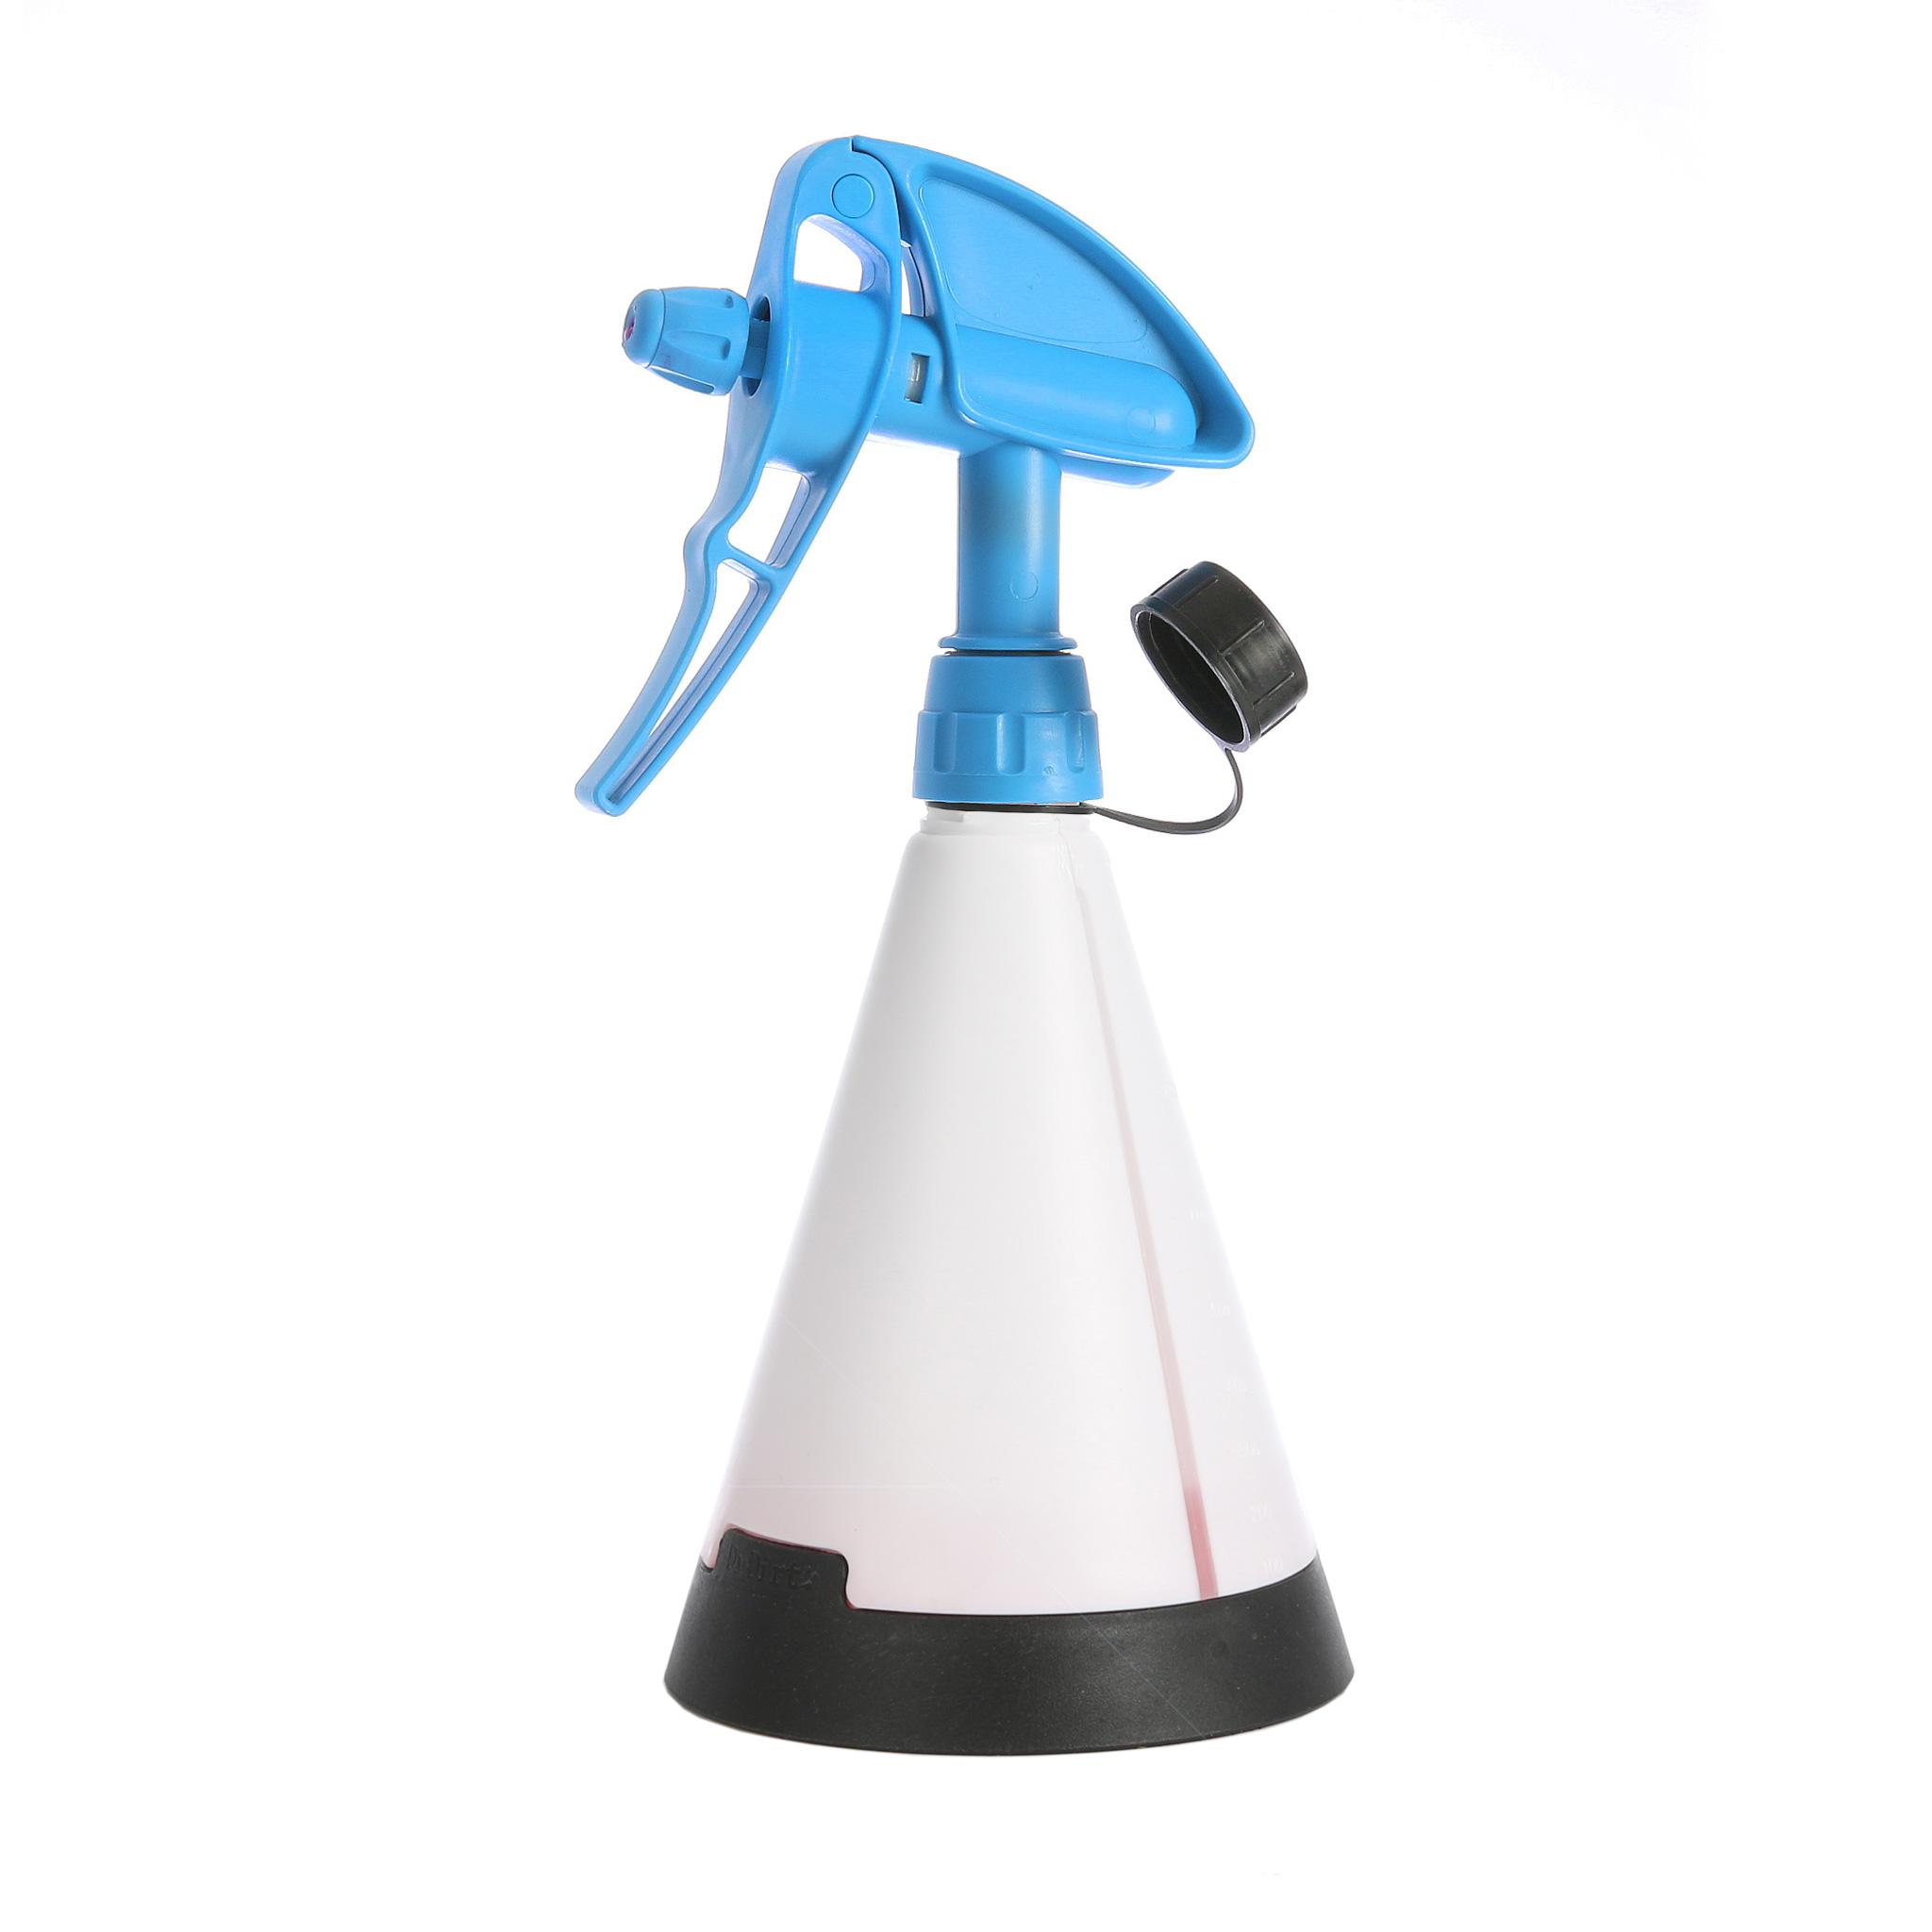 Sprayflaska Dr Dirt 360 PRO+, 800 ml, 6 st